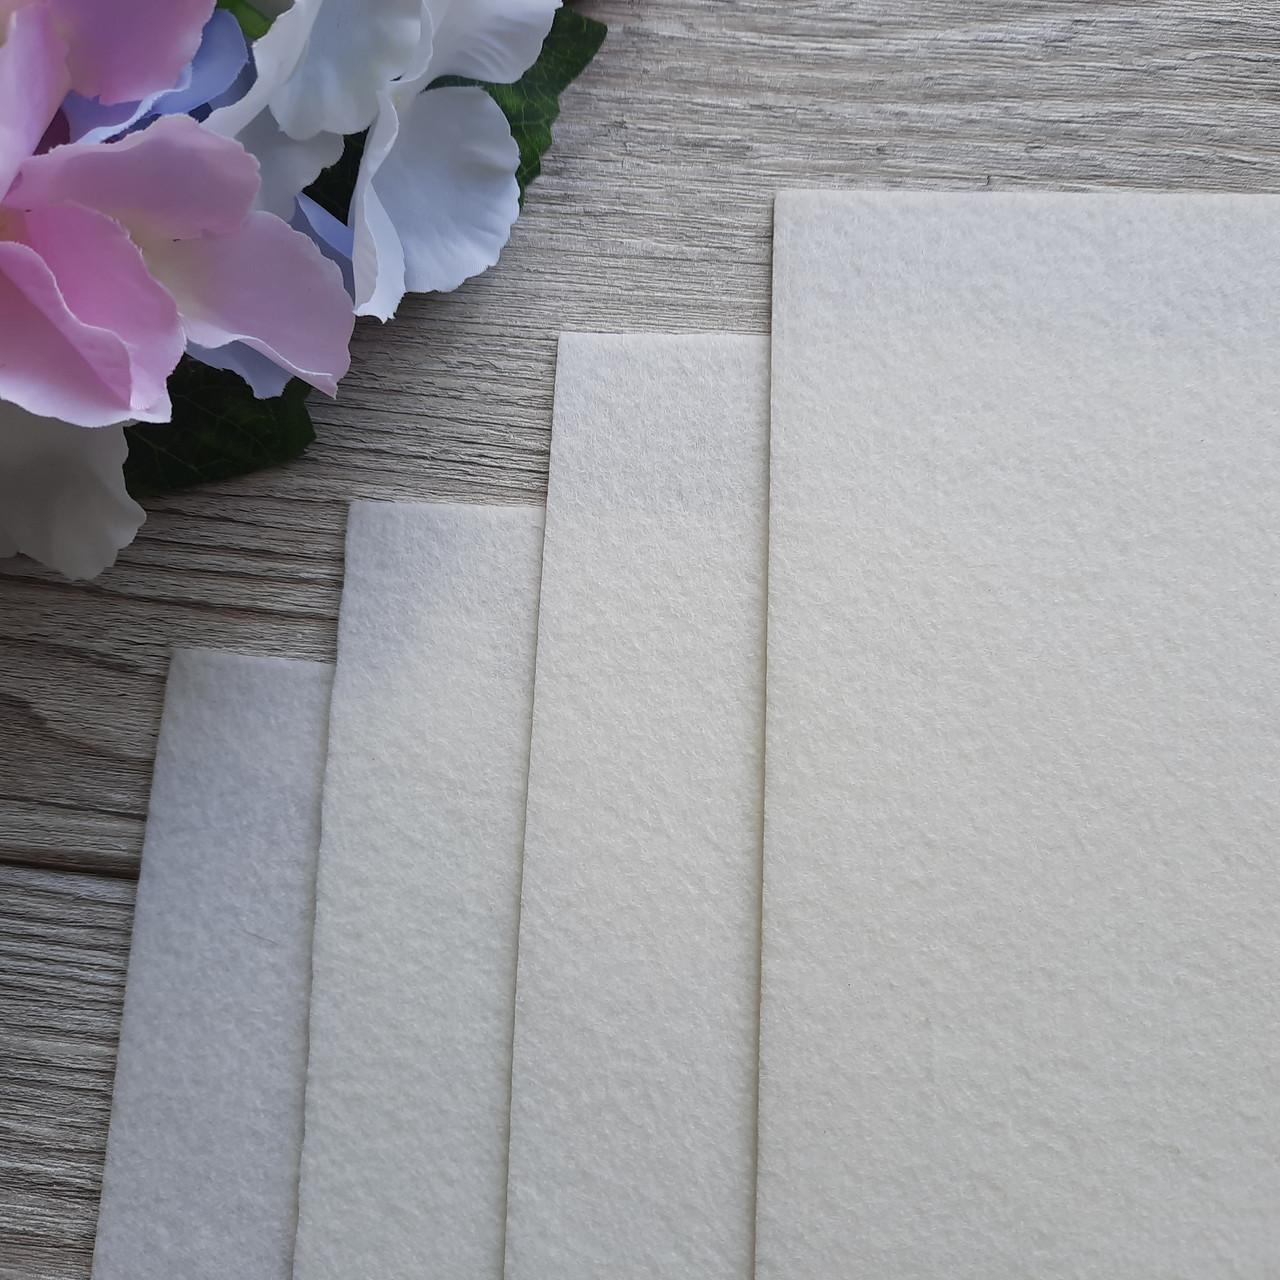 Фетр корейский жесткий 1.2 мм, 20 на 30 см Молочный